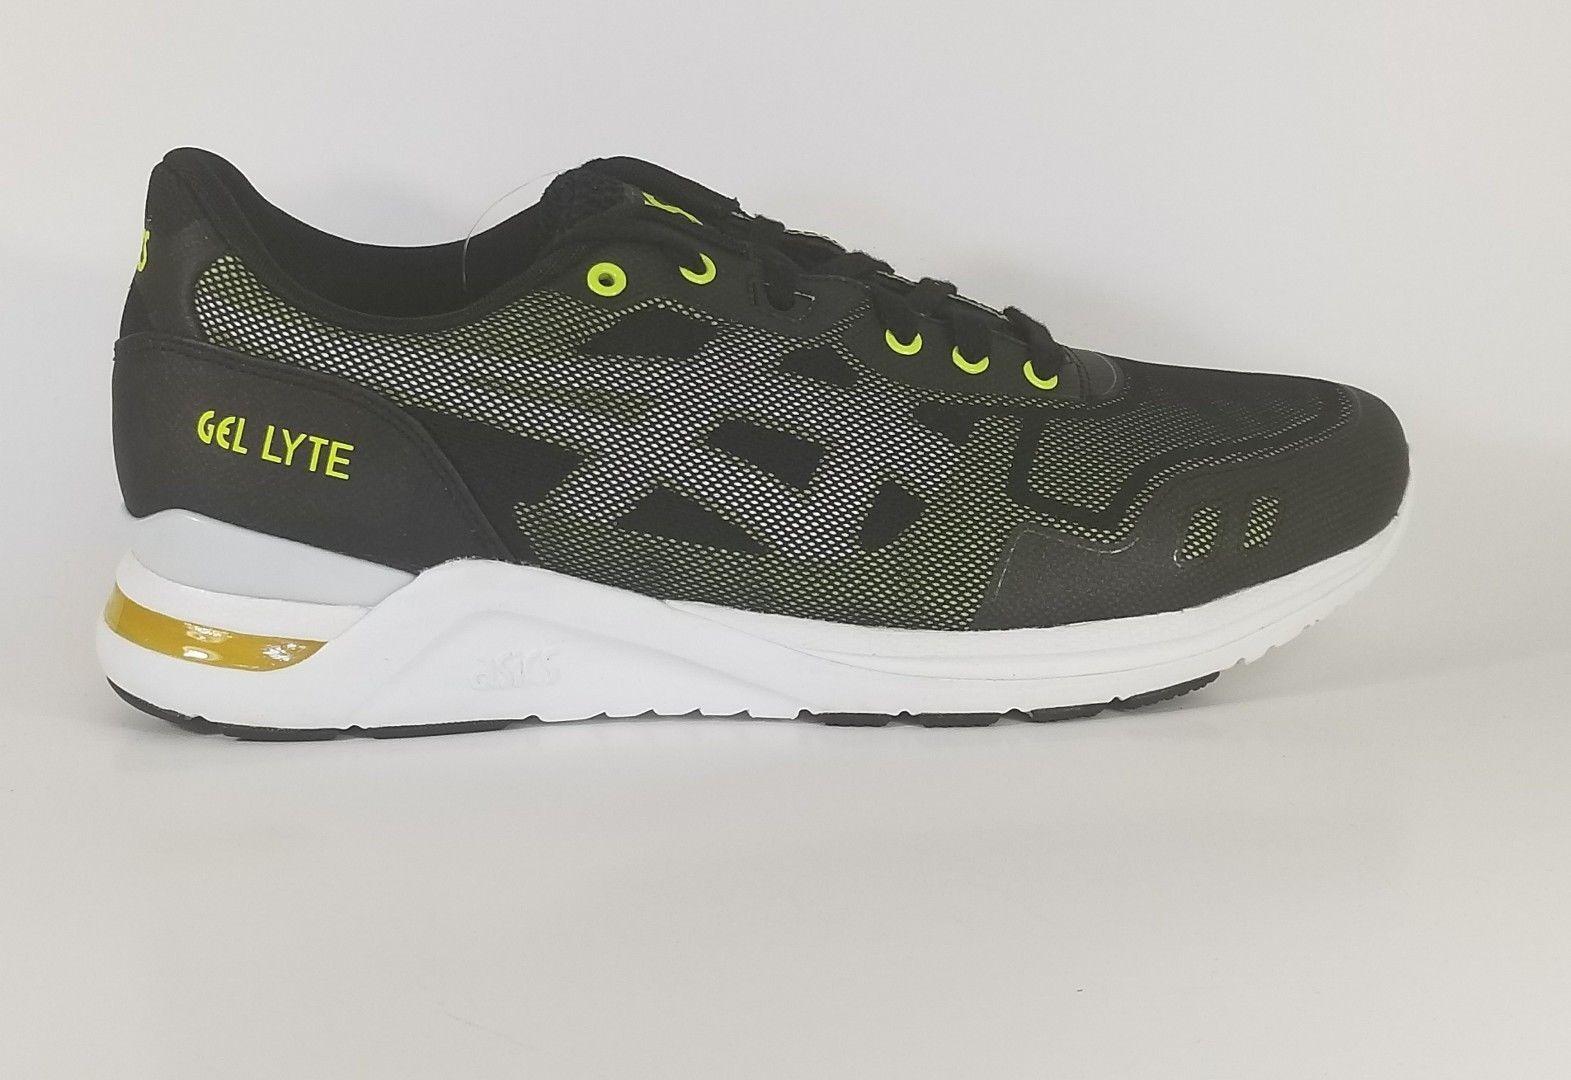 Men's New ASICS Gel-Lyte Evo Training Shoe Black/Yellow Sz 9